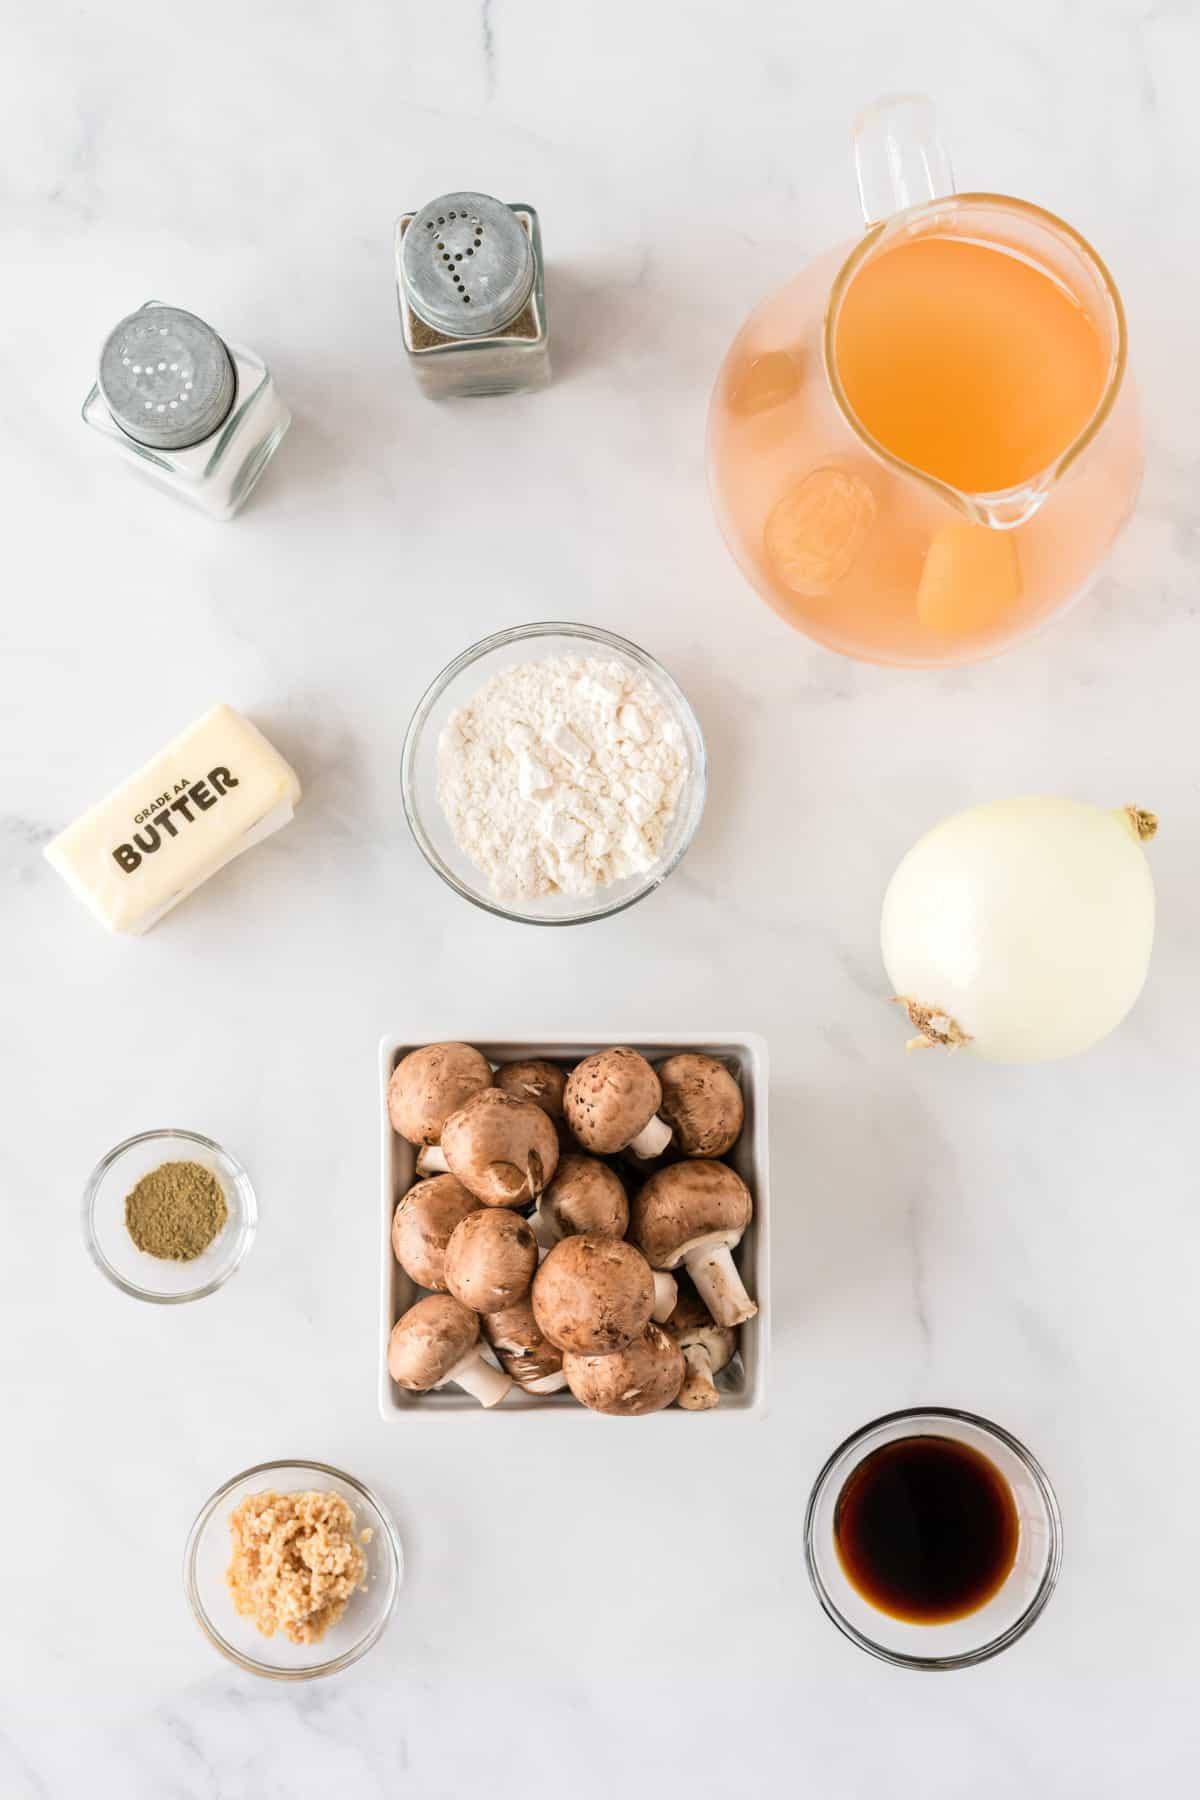 ingredients to make mushroom gravy